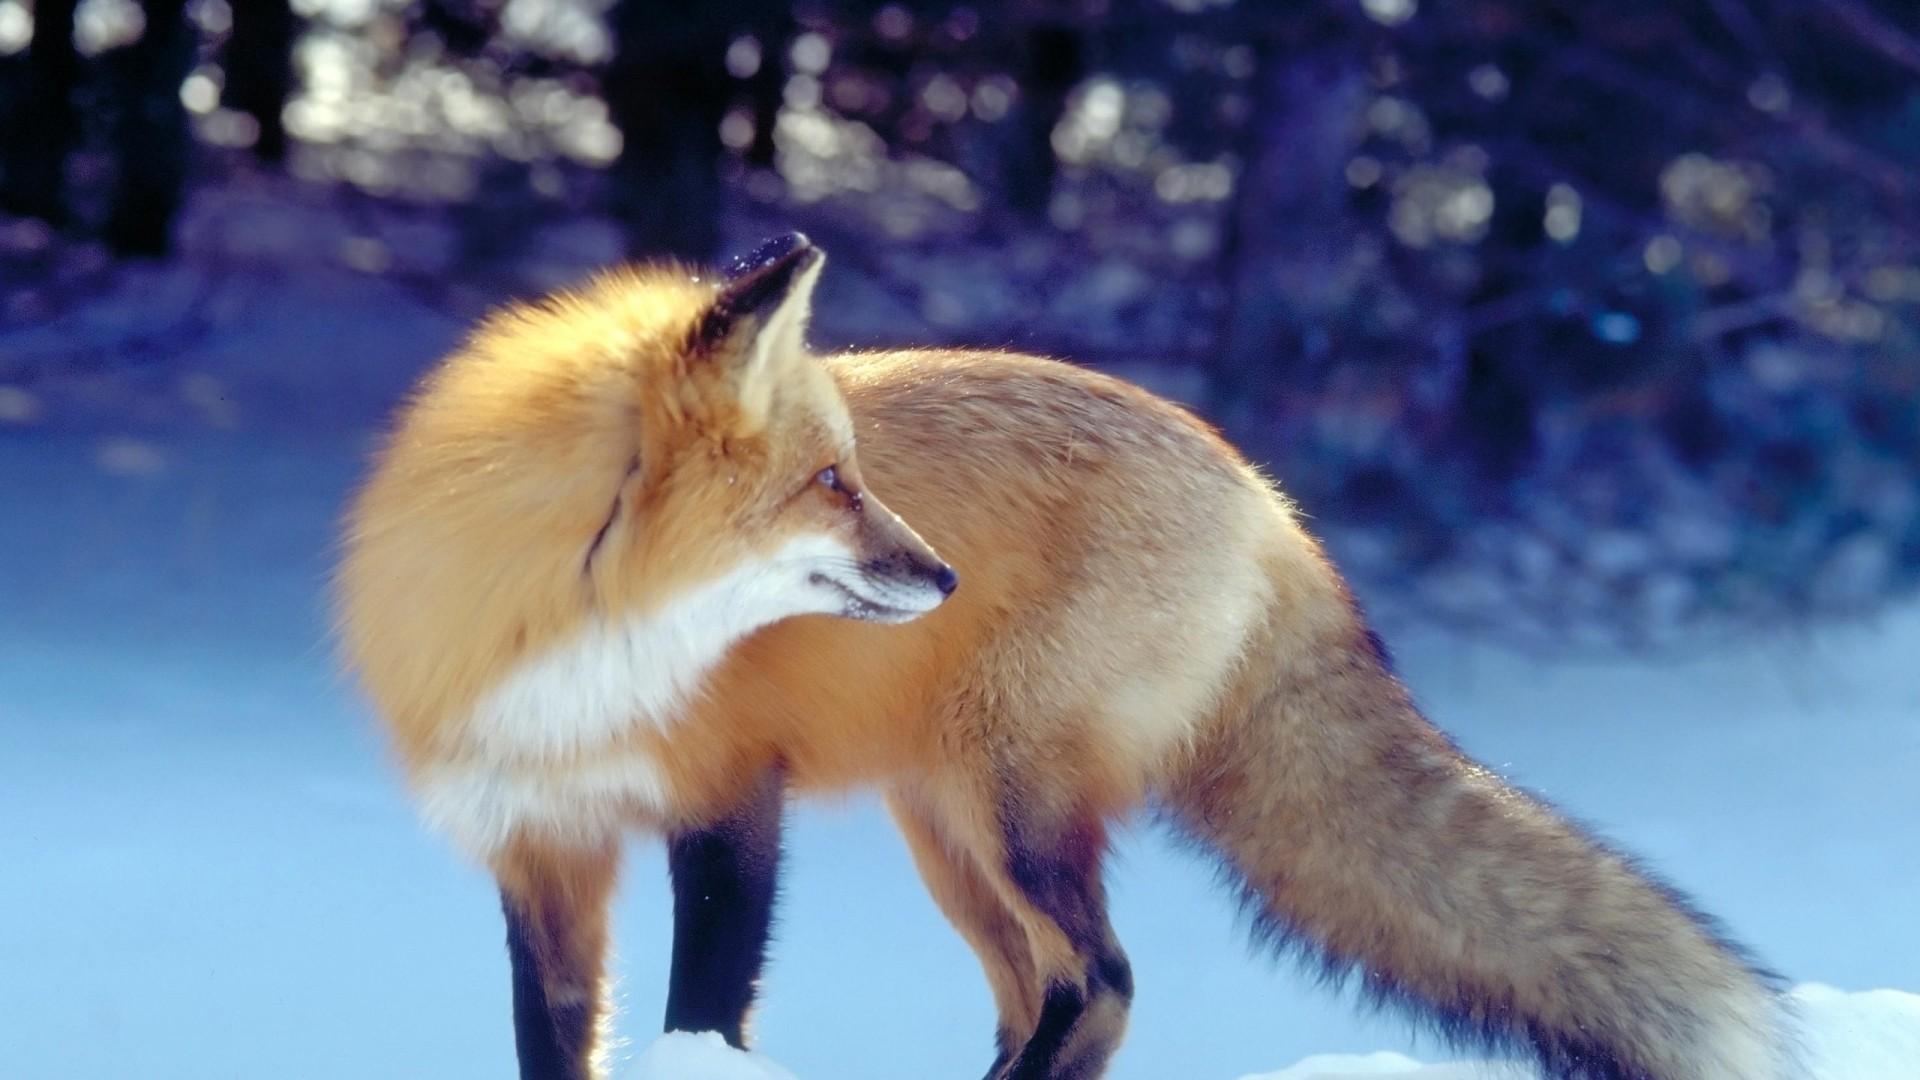 Winter Fox wallpaper photo hd